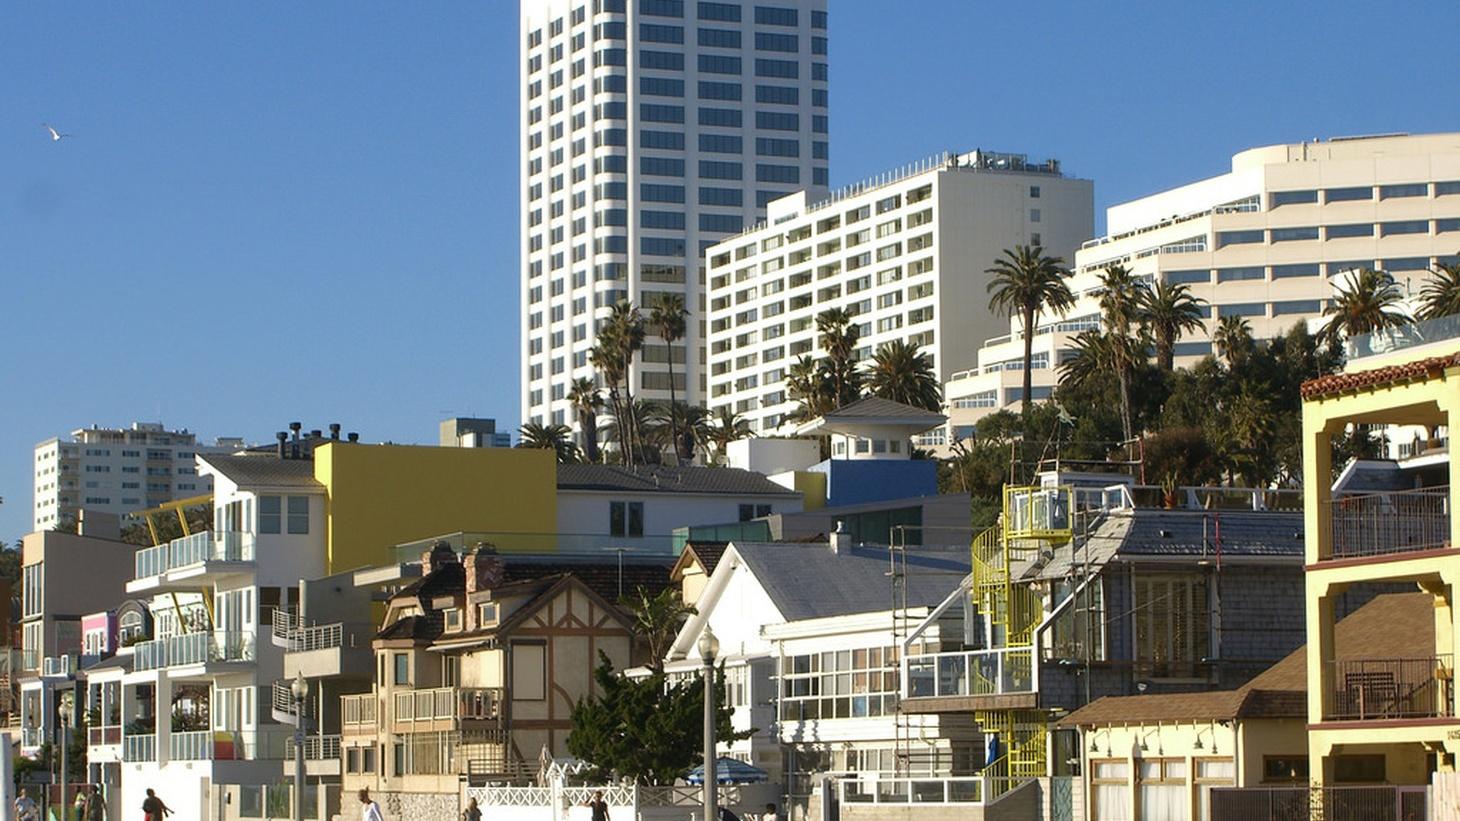 Will Santa Monica's affordable housing goals backfire? | KCRW